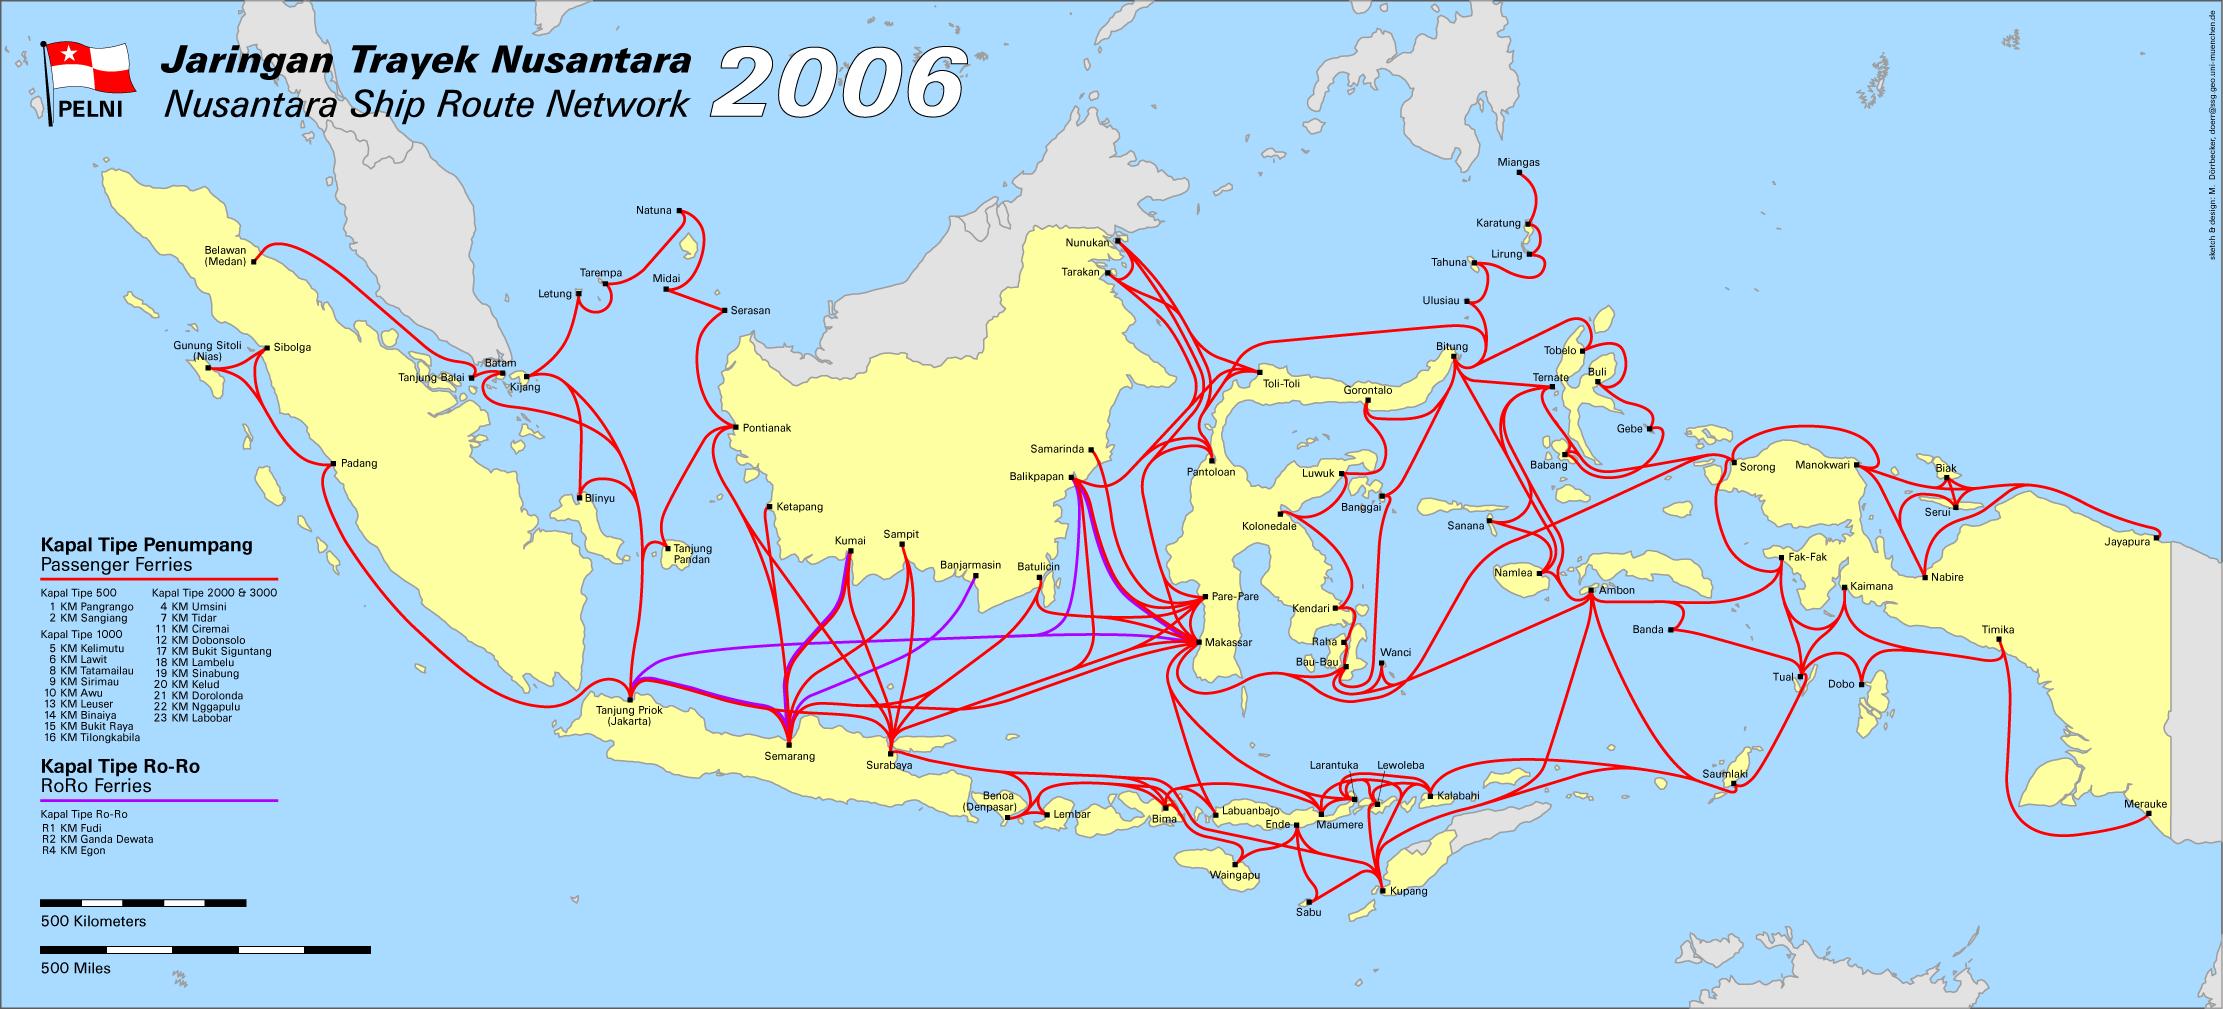 World Map Around Indonesia. My mode of transport when Island hoping in Indonesia  Pelni Ferry Trip around to ferries Scheme Pinterest